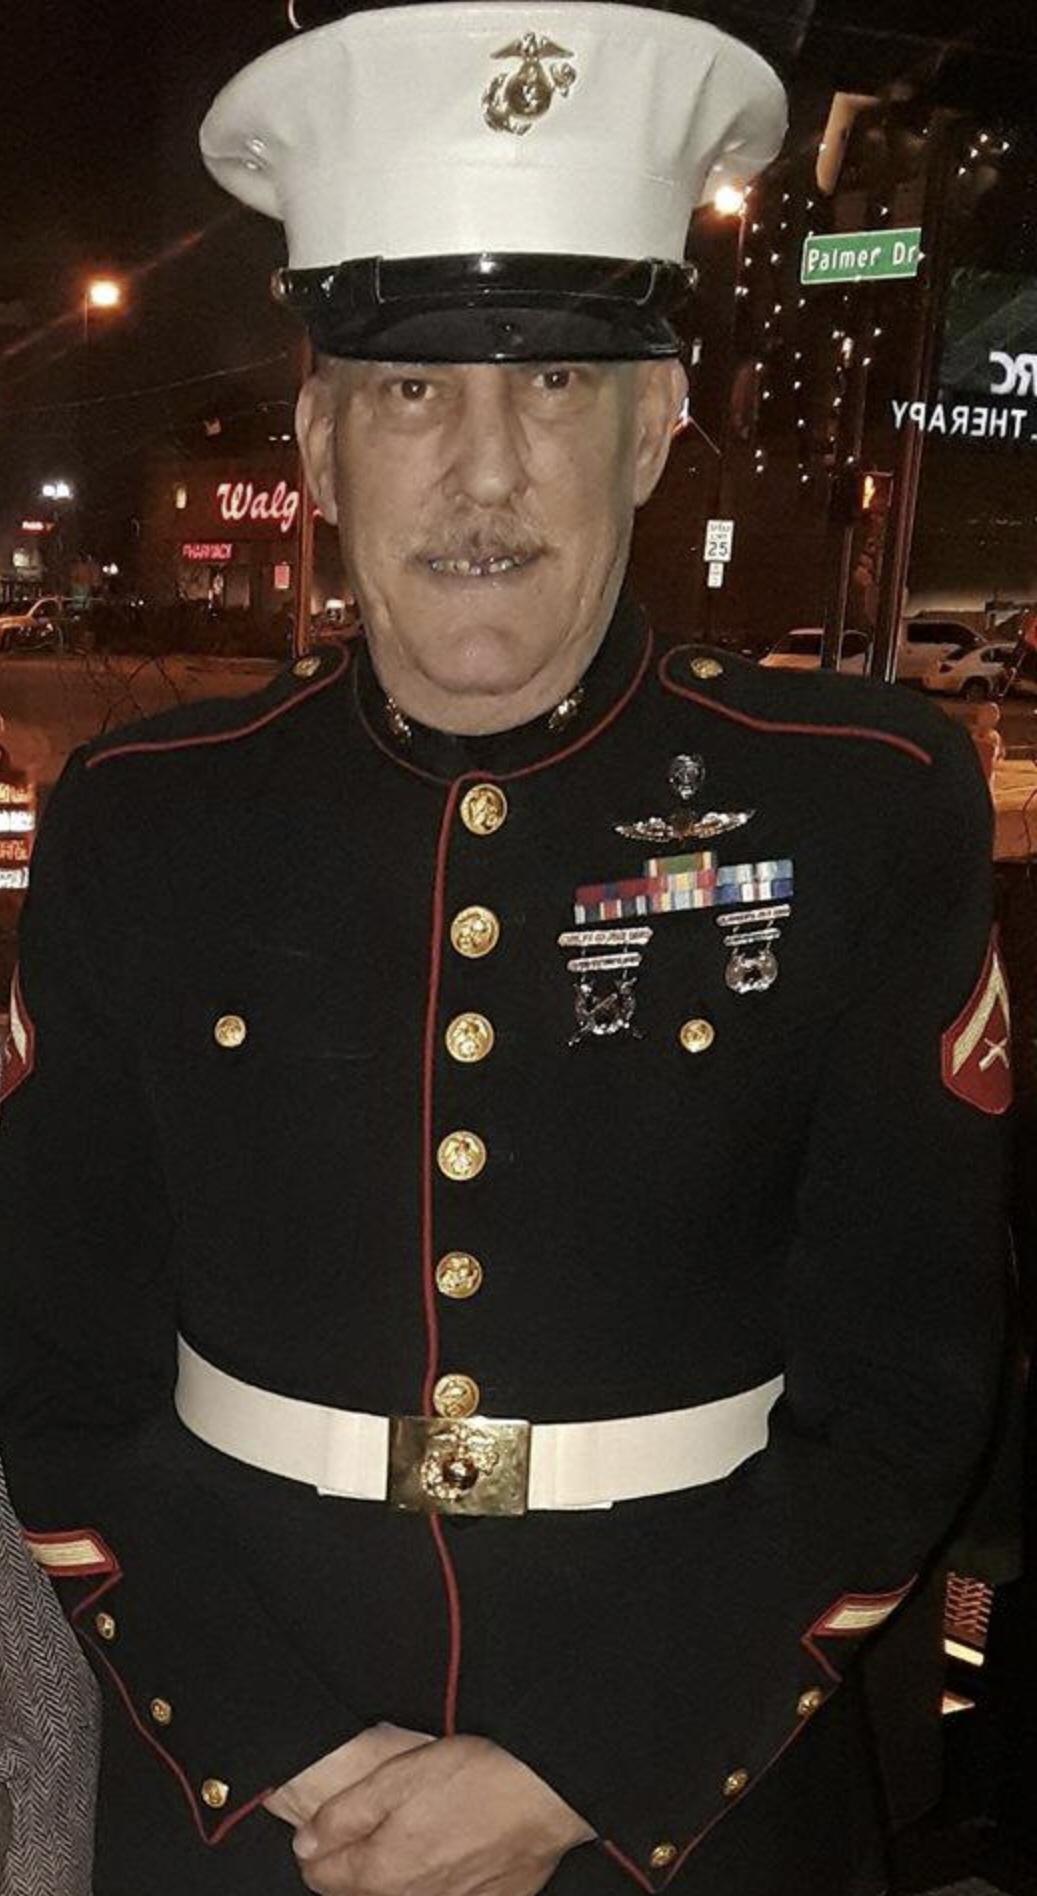 Steven G  Swiertz – U S M C  Recon, Scout Sniper, 16 Years Military